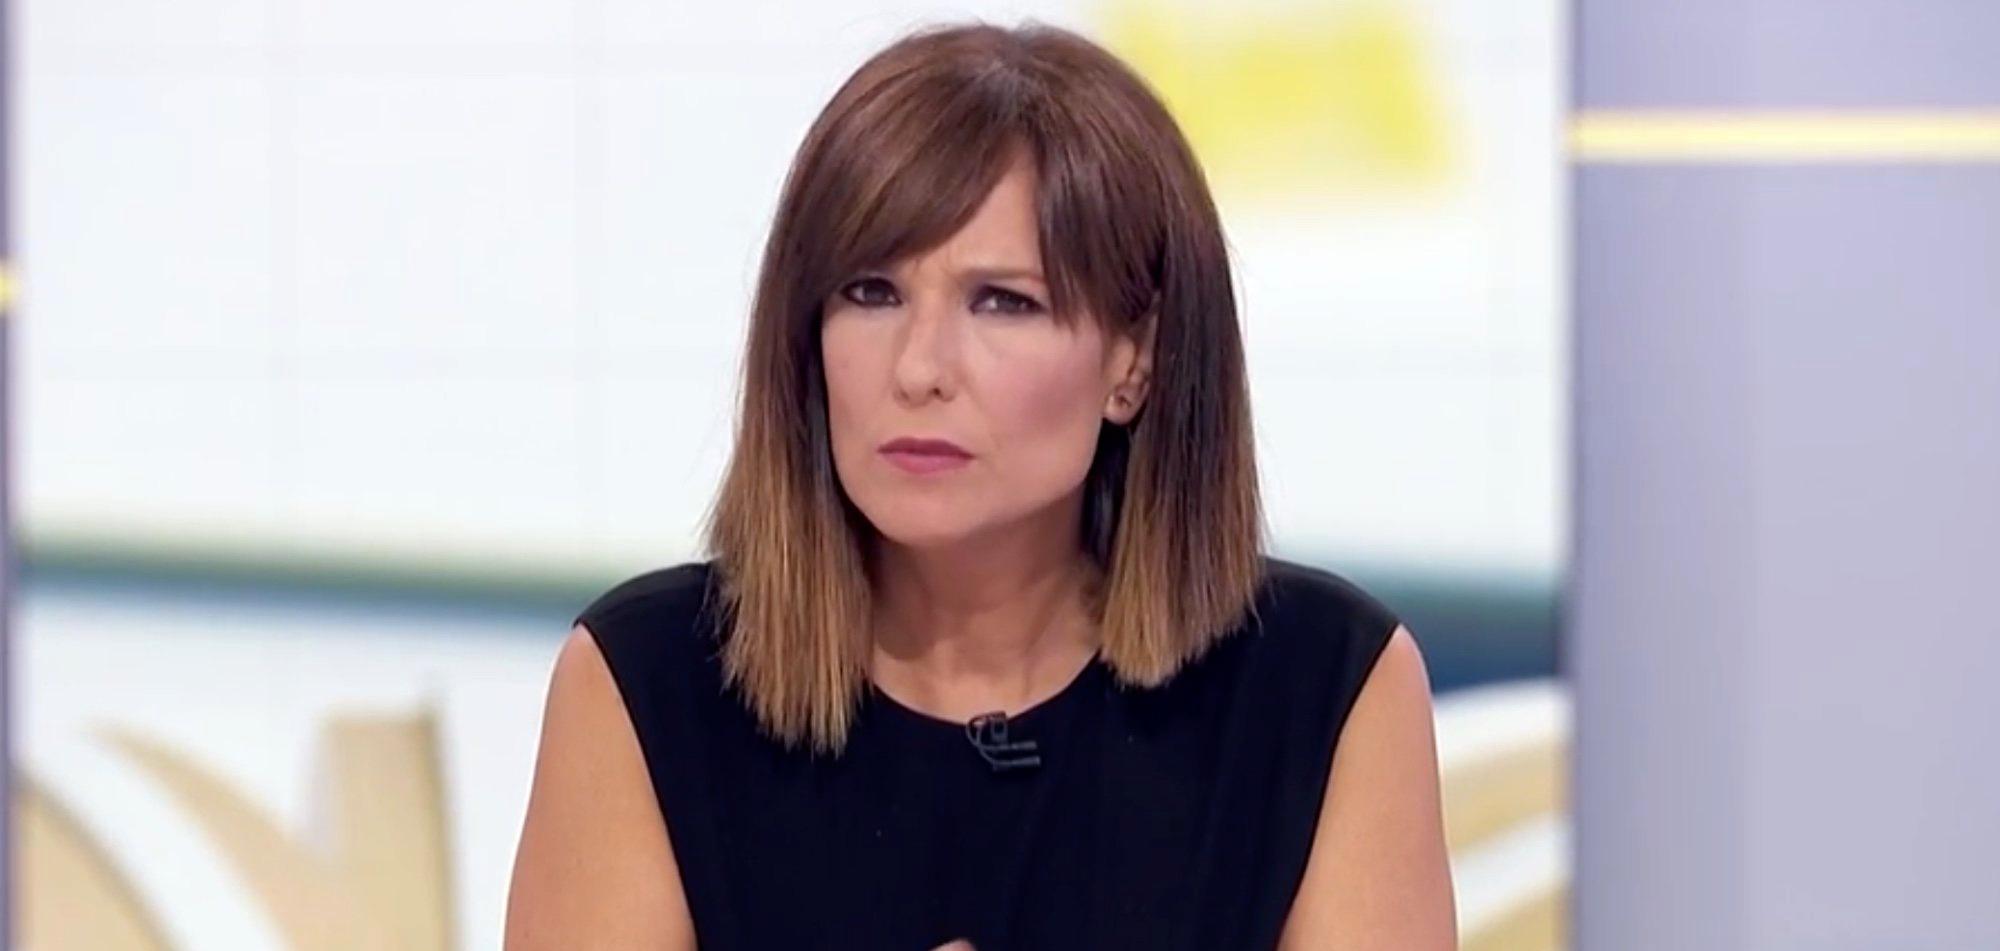 Mónica López, durant una entrevista a 'La hora de la 1' - TVE